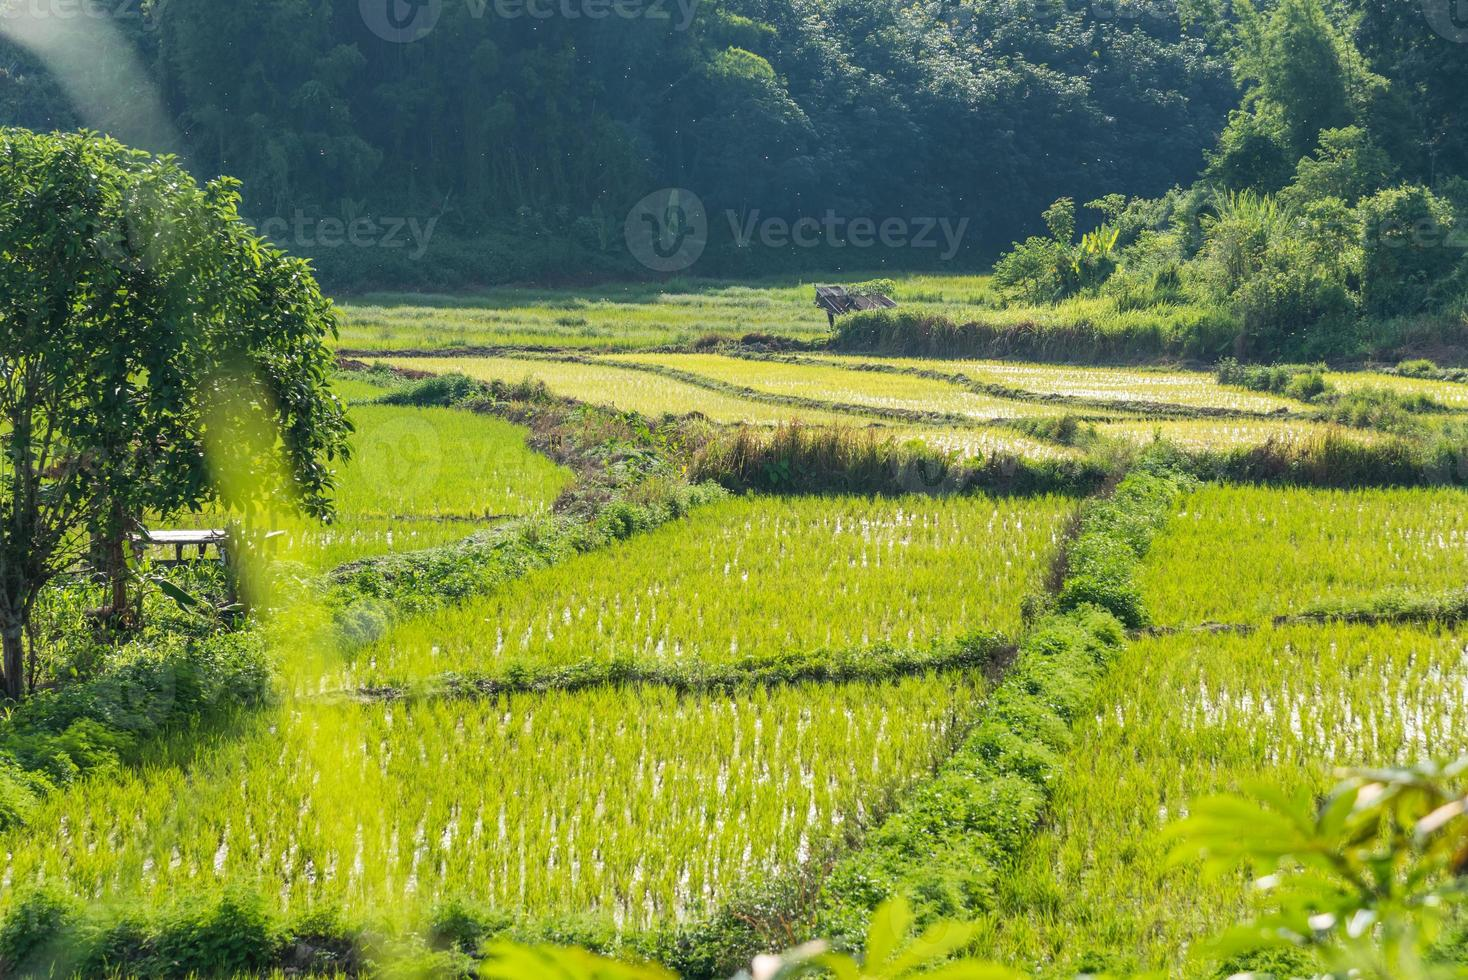 arroz archivado cielo azul cabaña de madera foto